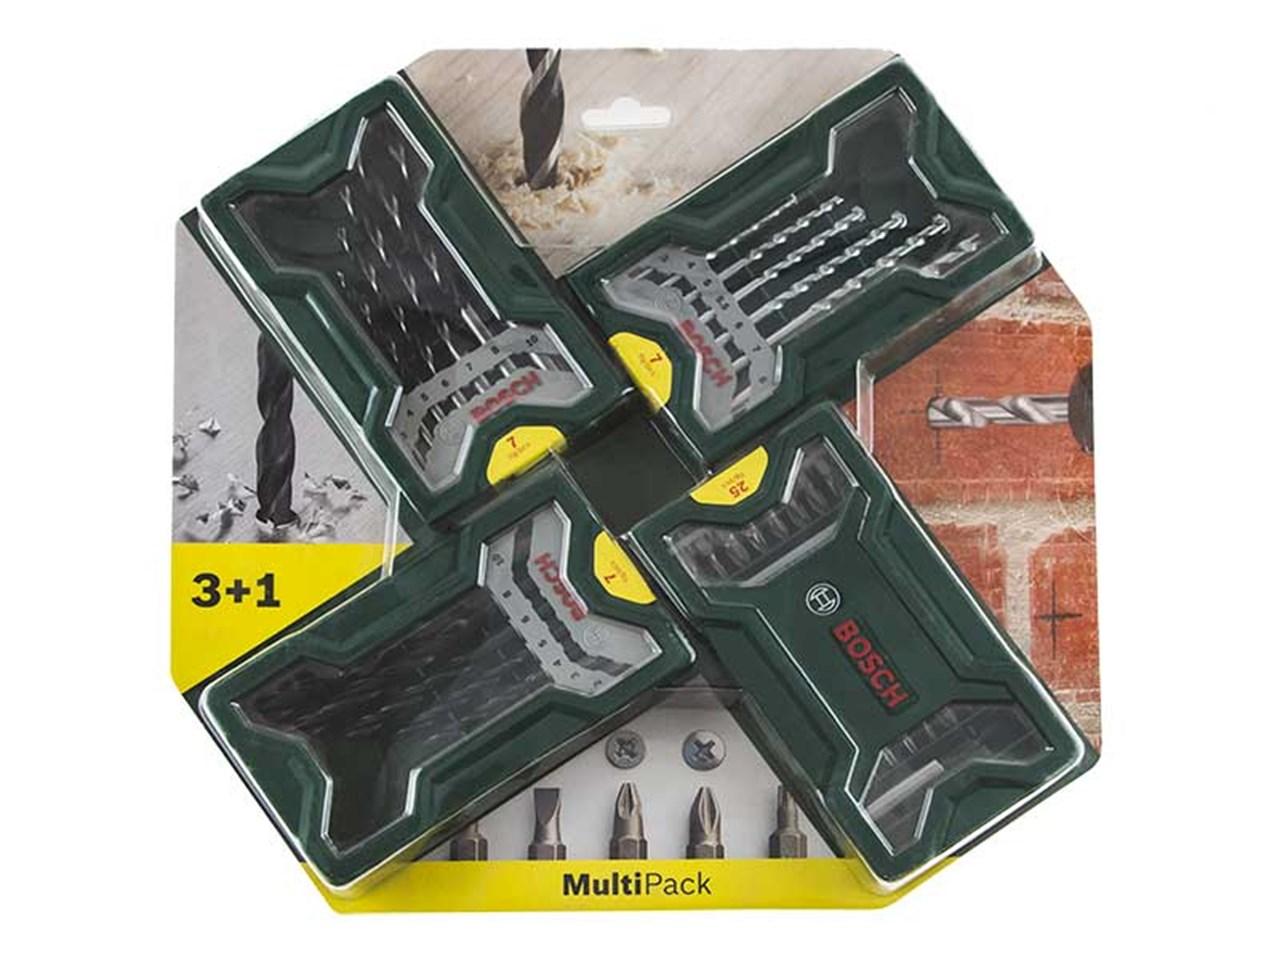 Voorkeur Bosch 2607017071 3+1 Mini X-Line Multipack set KX02